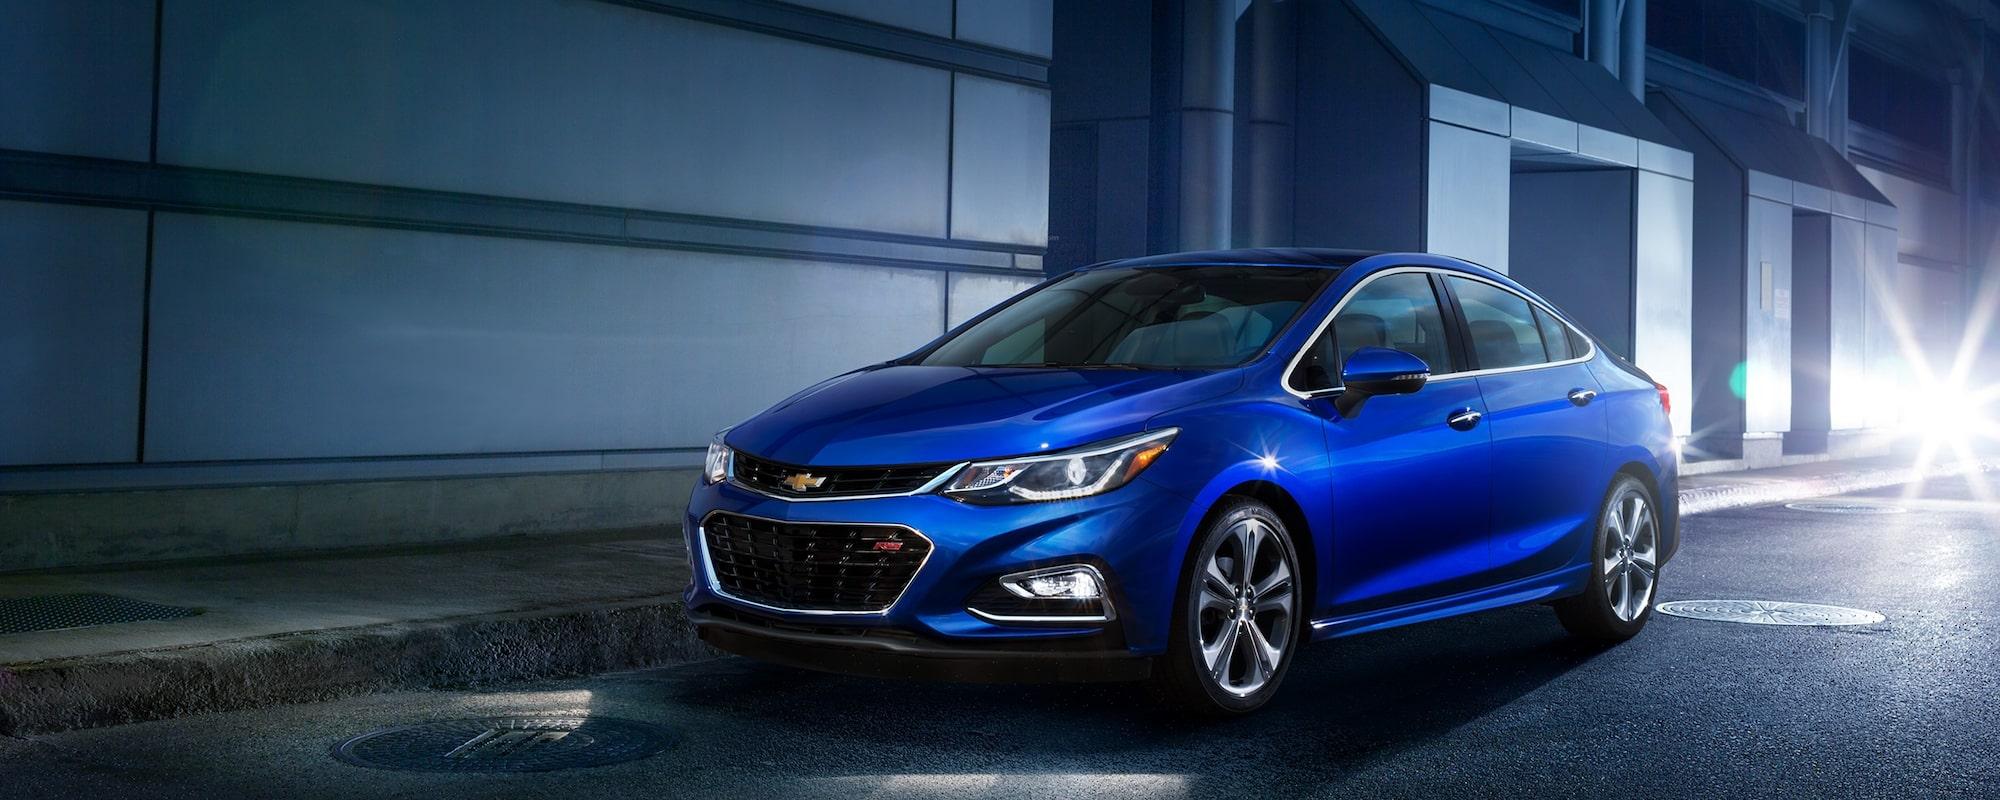 Cars: Coupes, Sedans   Hatchbacks | Chevrolet